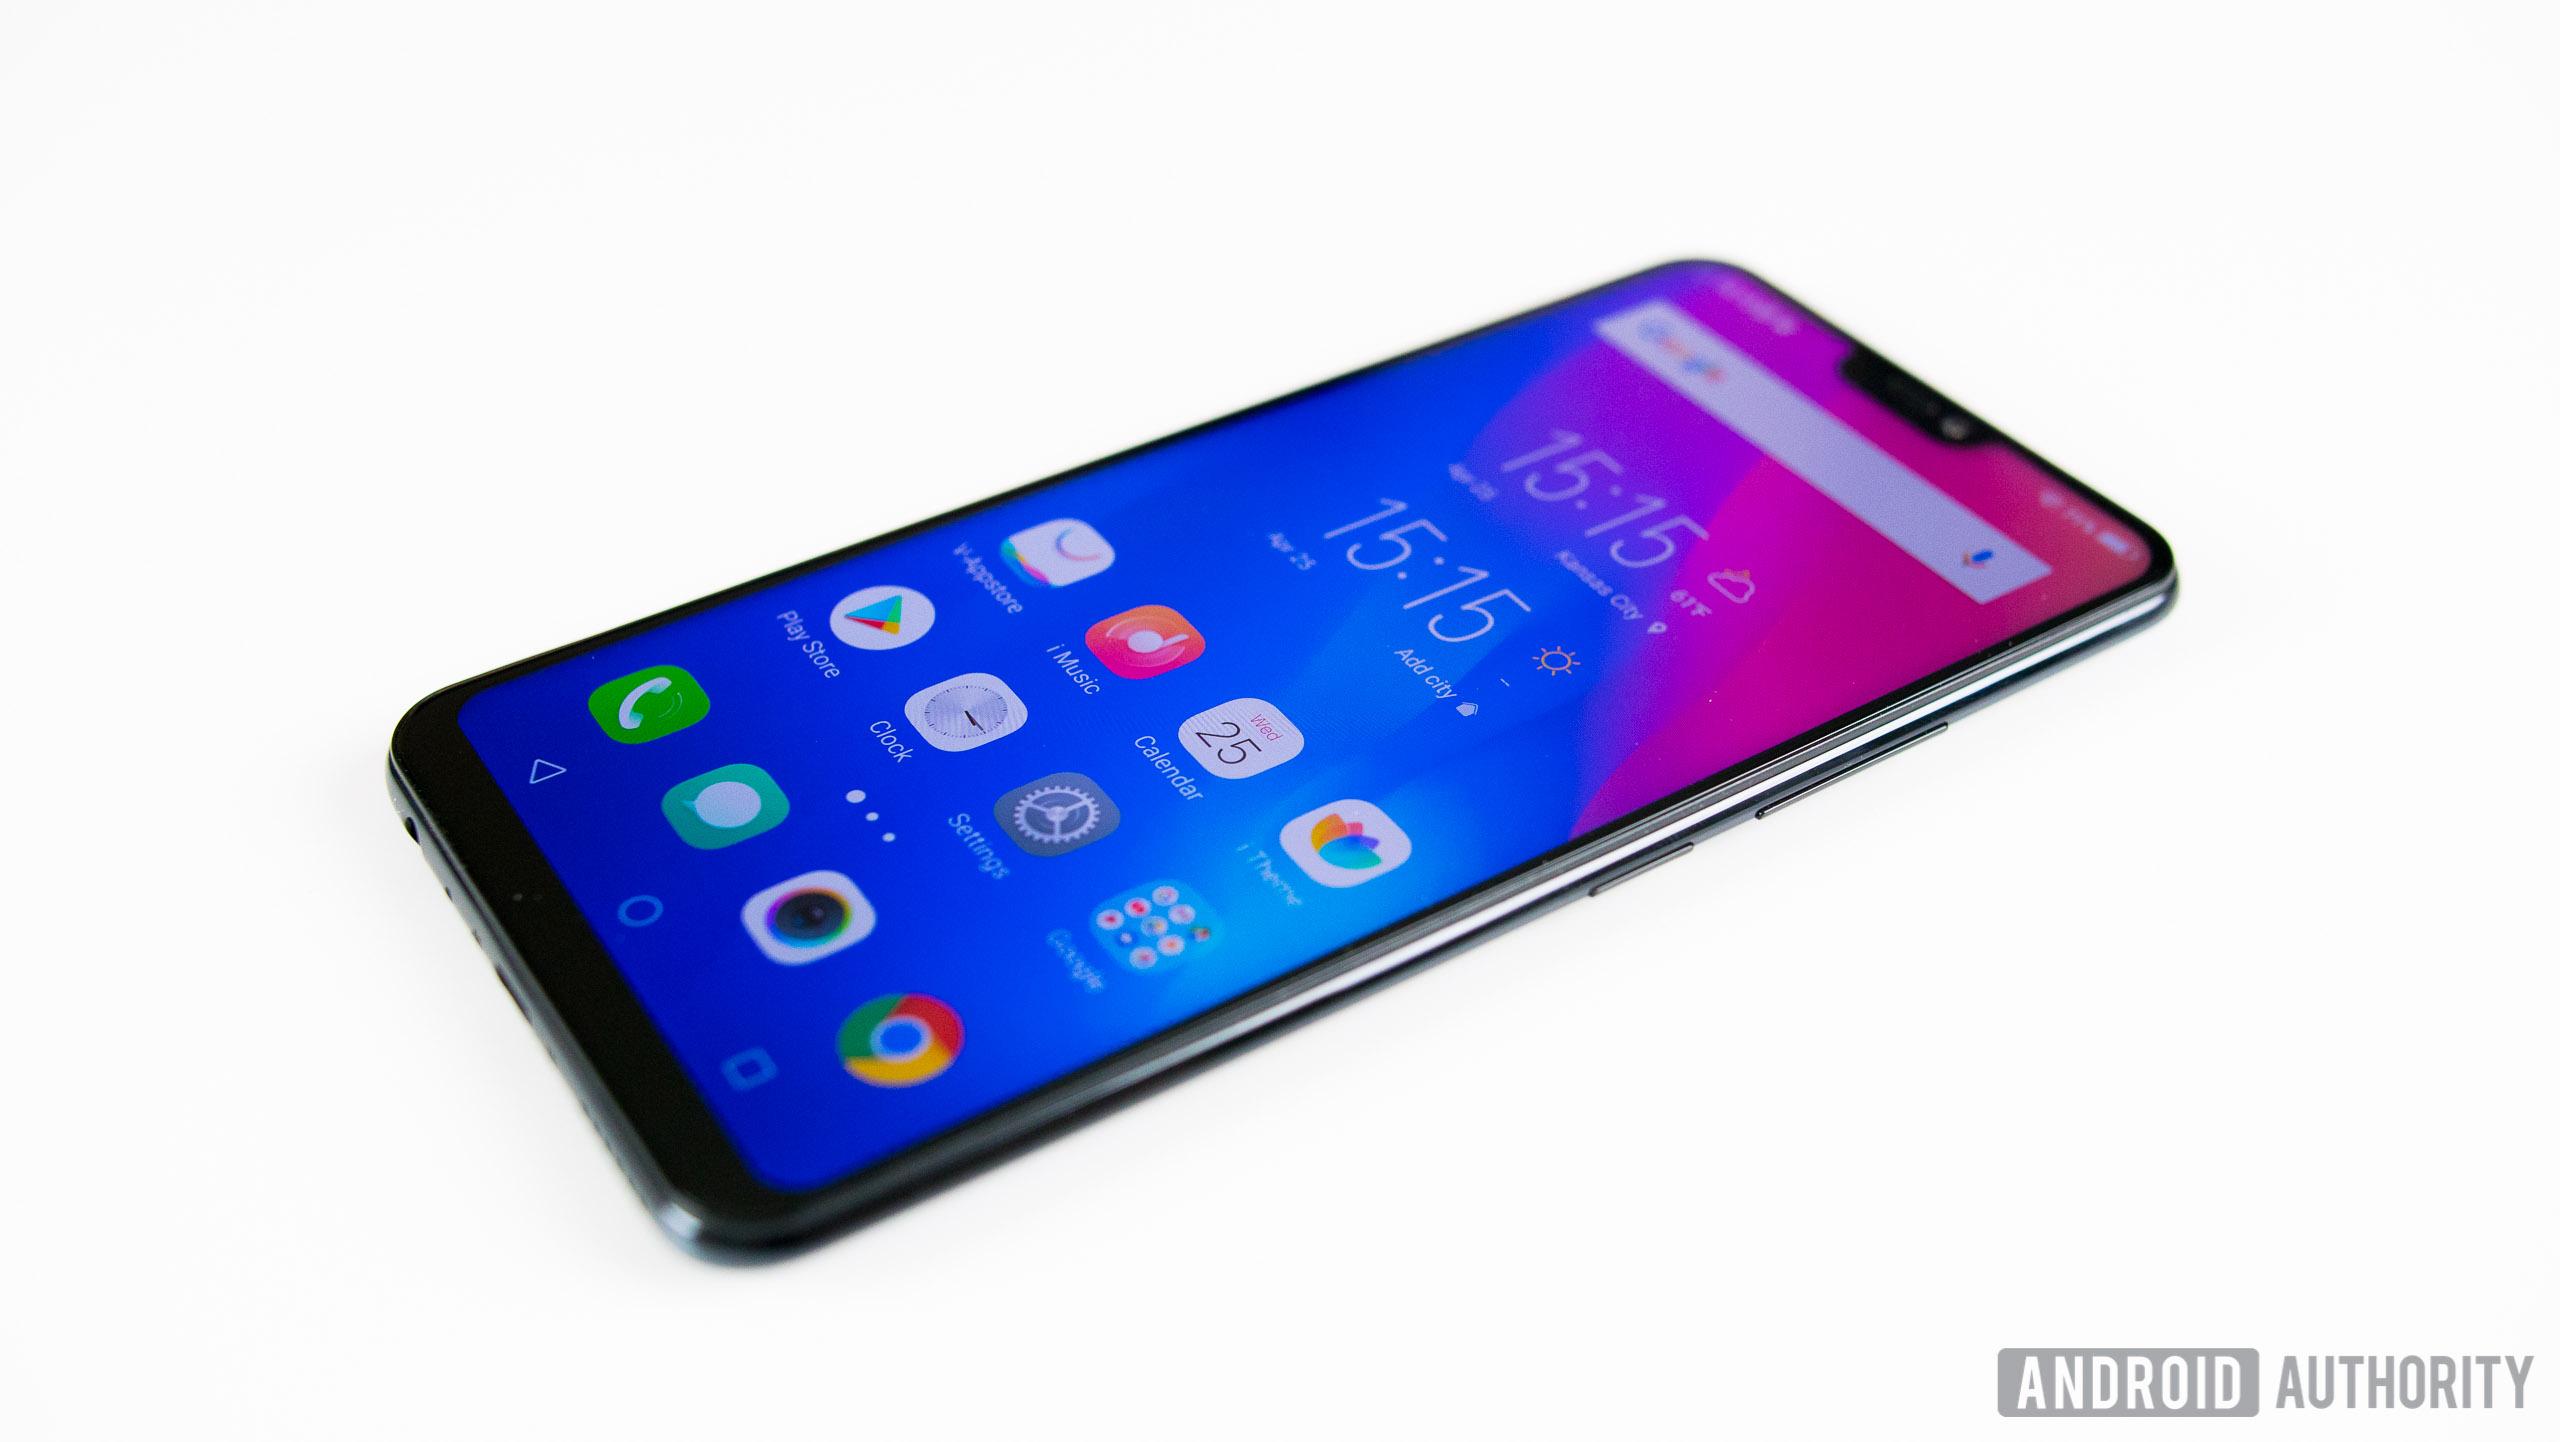 Vivo V9 home screen apps